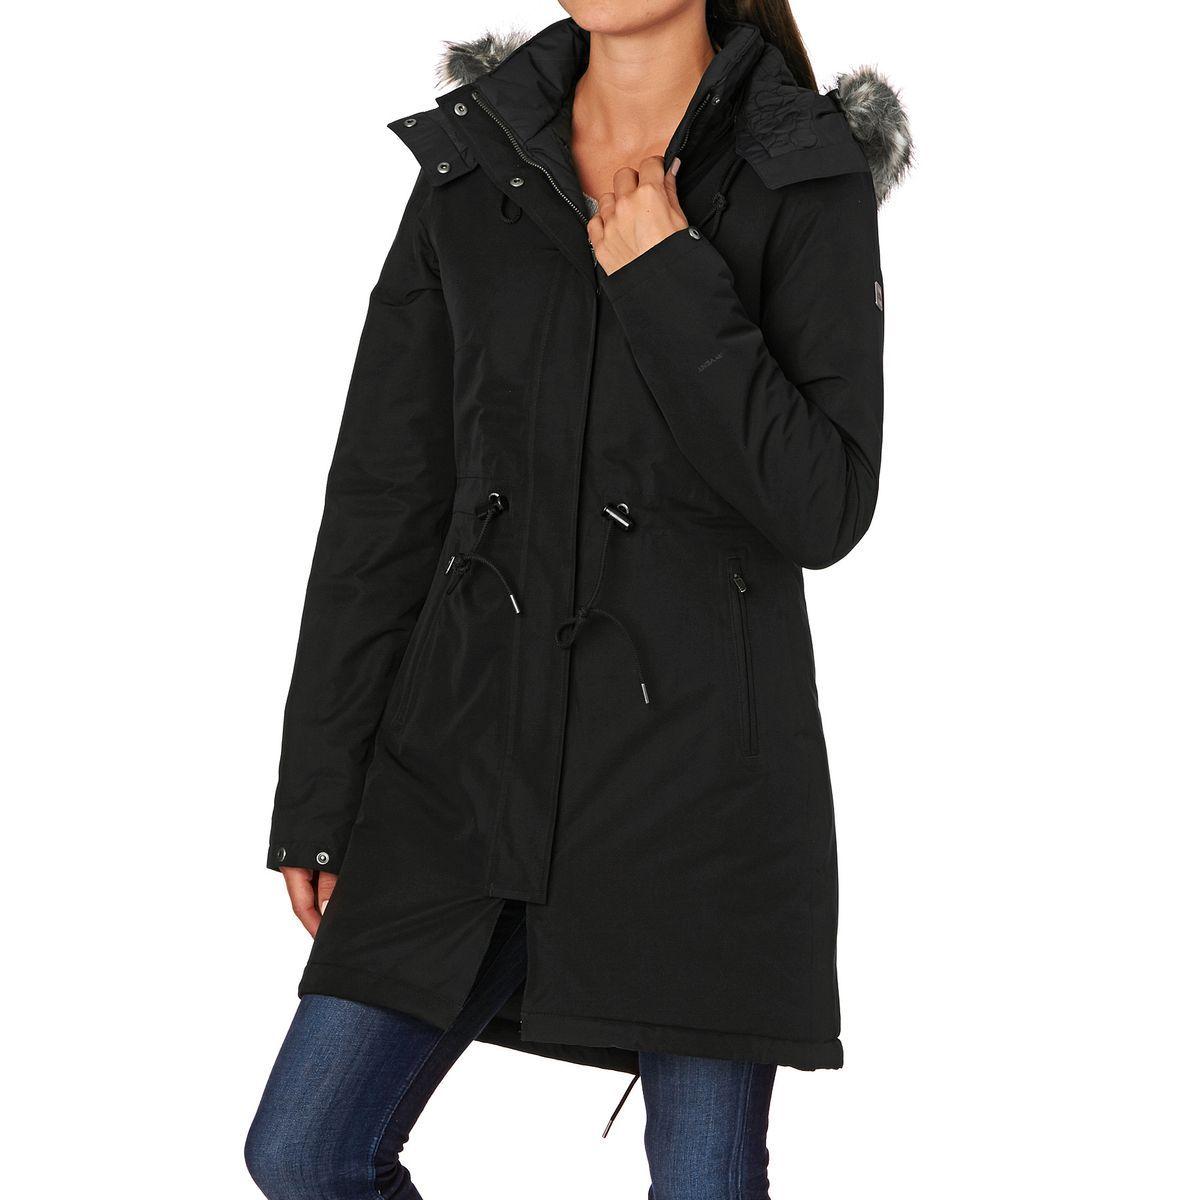 813c28fde3 The North Face Women s Zaneck Parka Jacket - TNF Black